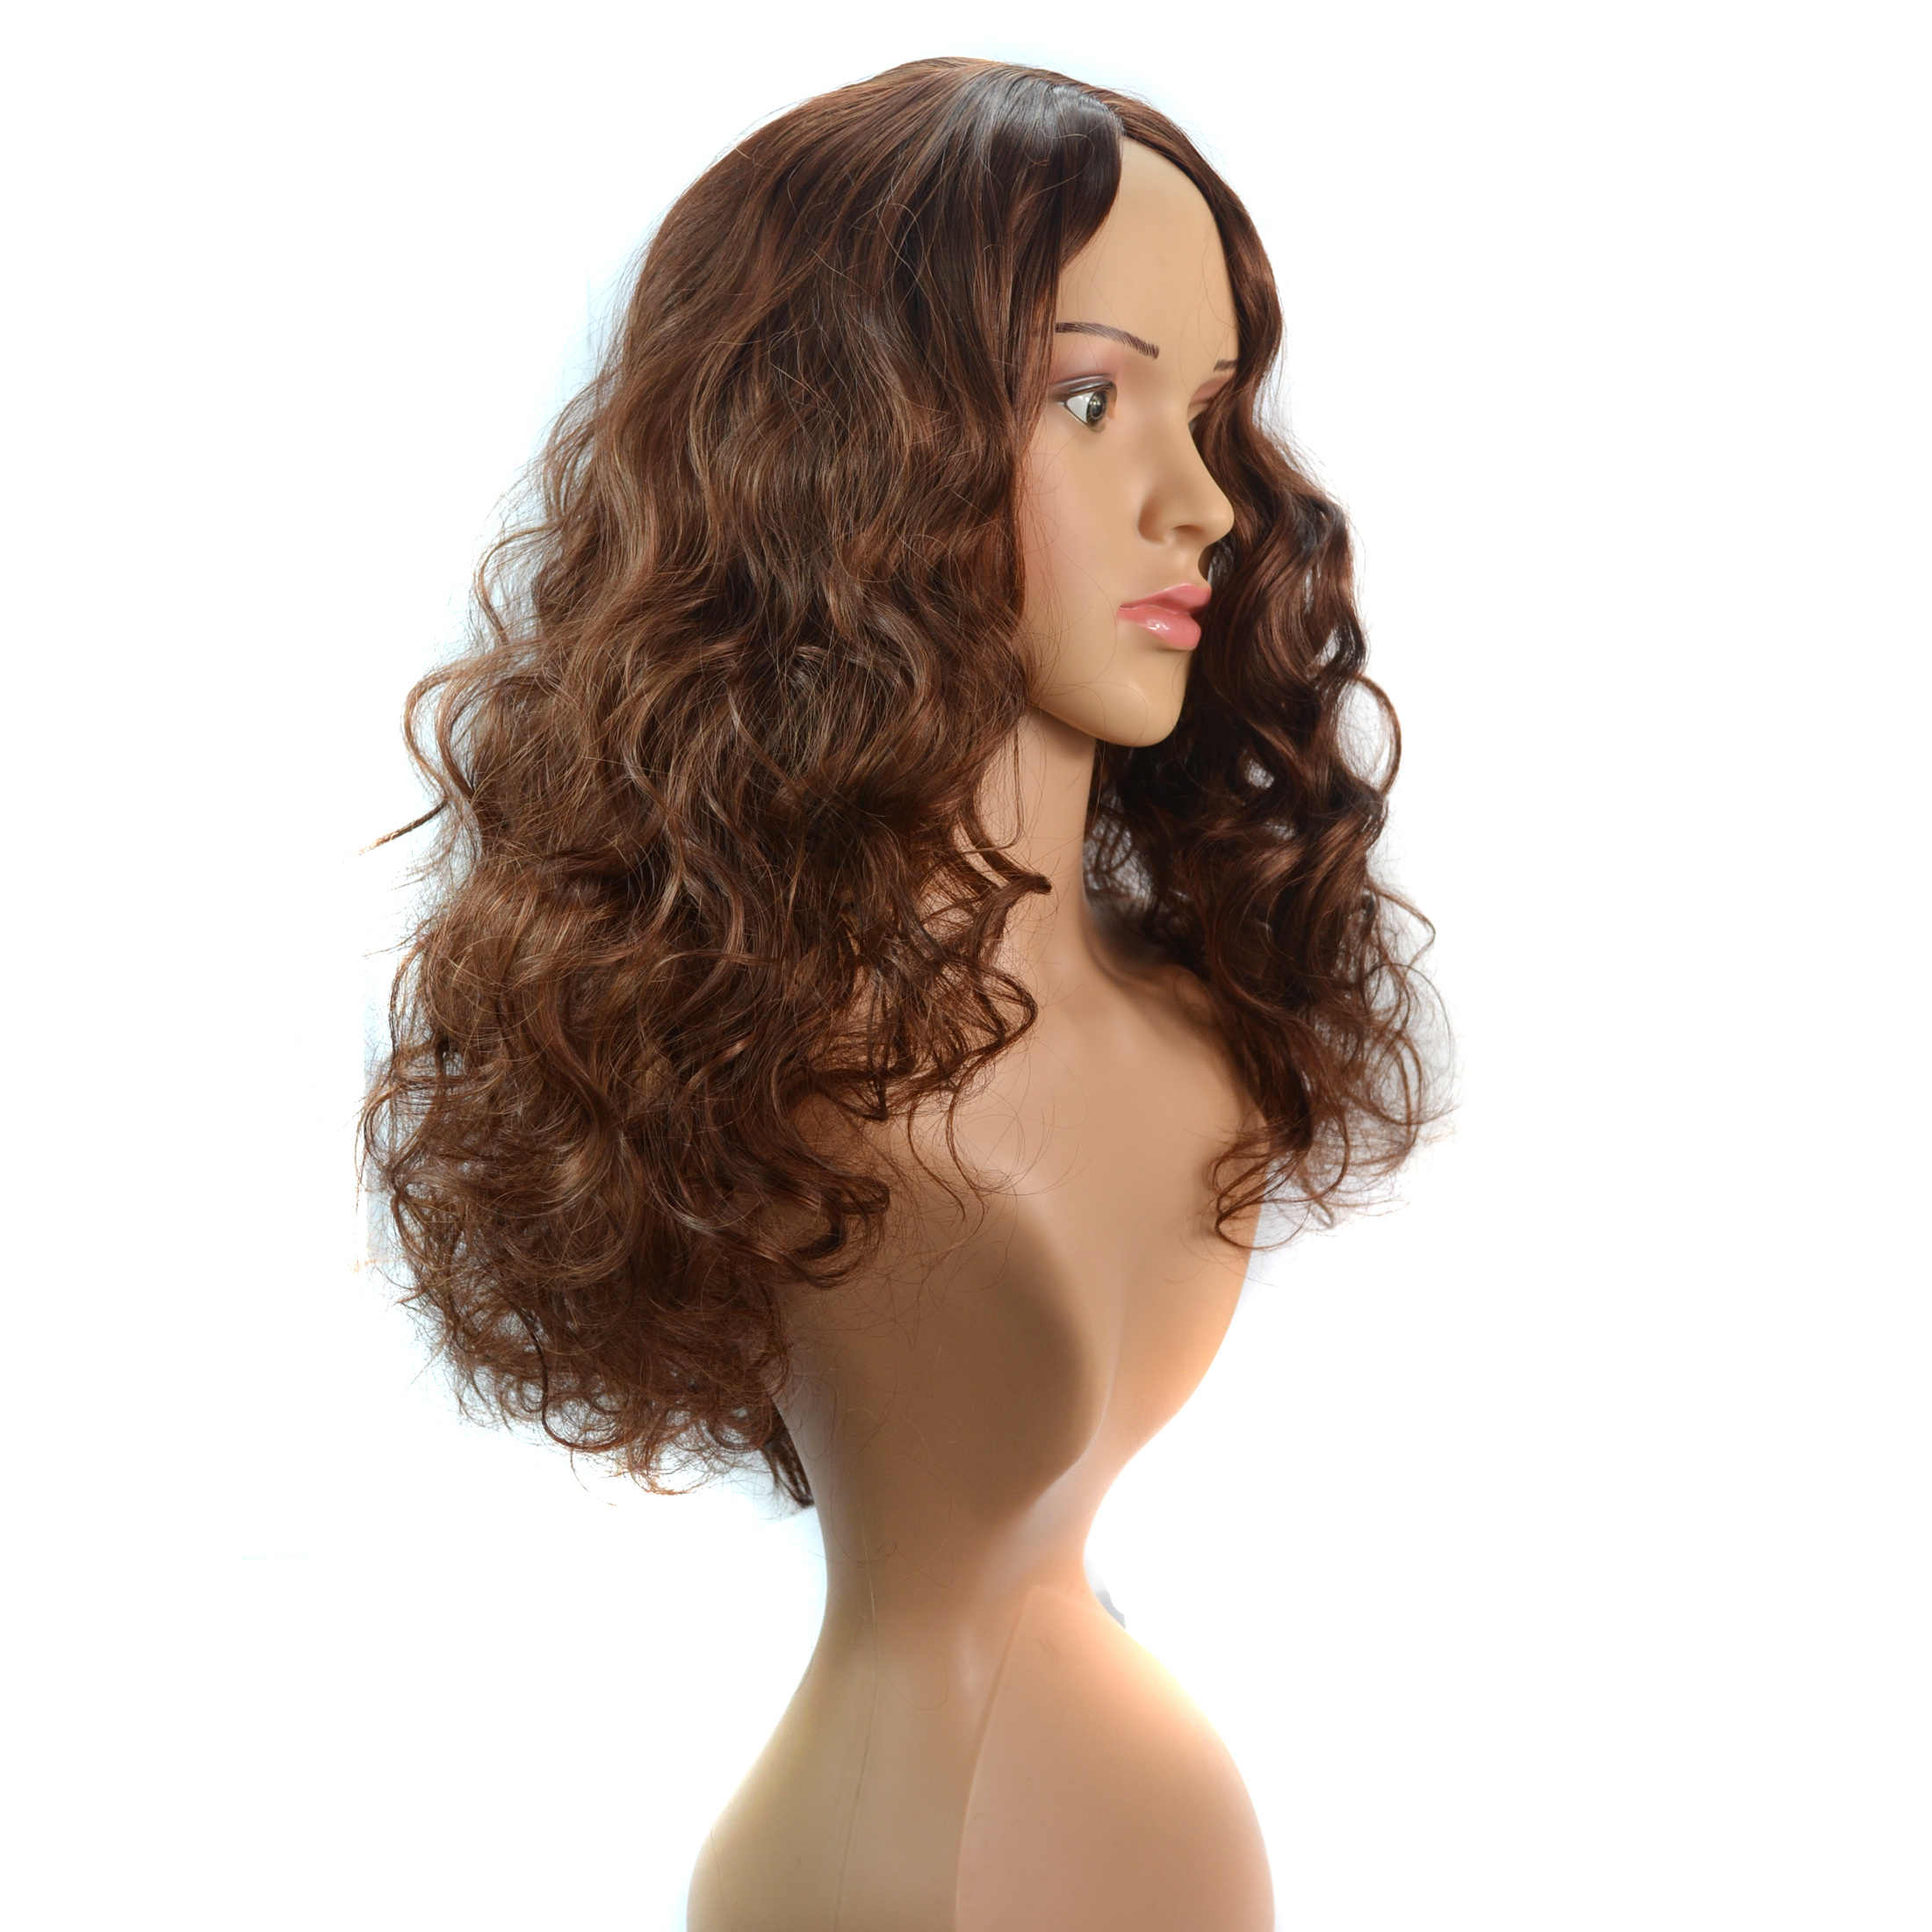 Beiyufei Rambut Sintetis Wig Gelombang Longgar Hitam 38 Inch Ombre Rambut Pirang Gelombang Dalam Super Panjang Bergelombang Sintetis Wig untuk Hitam wanita